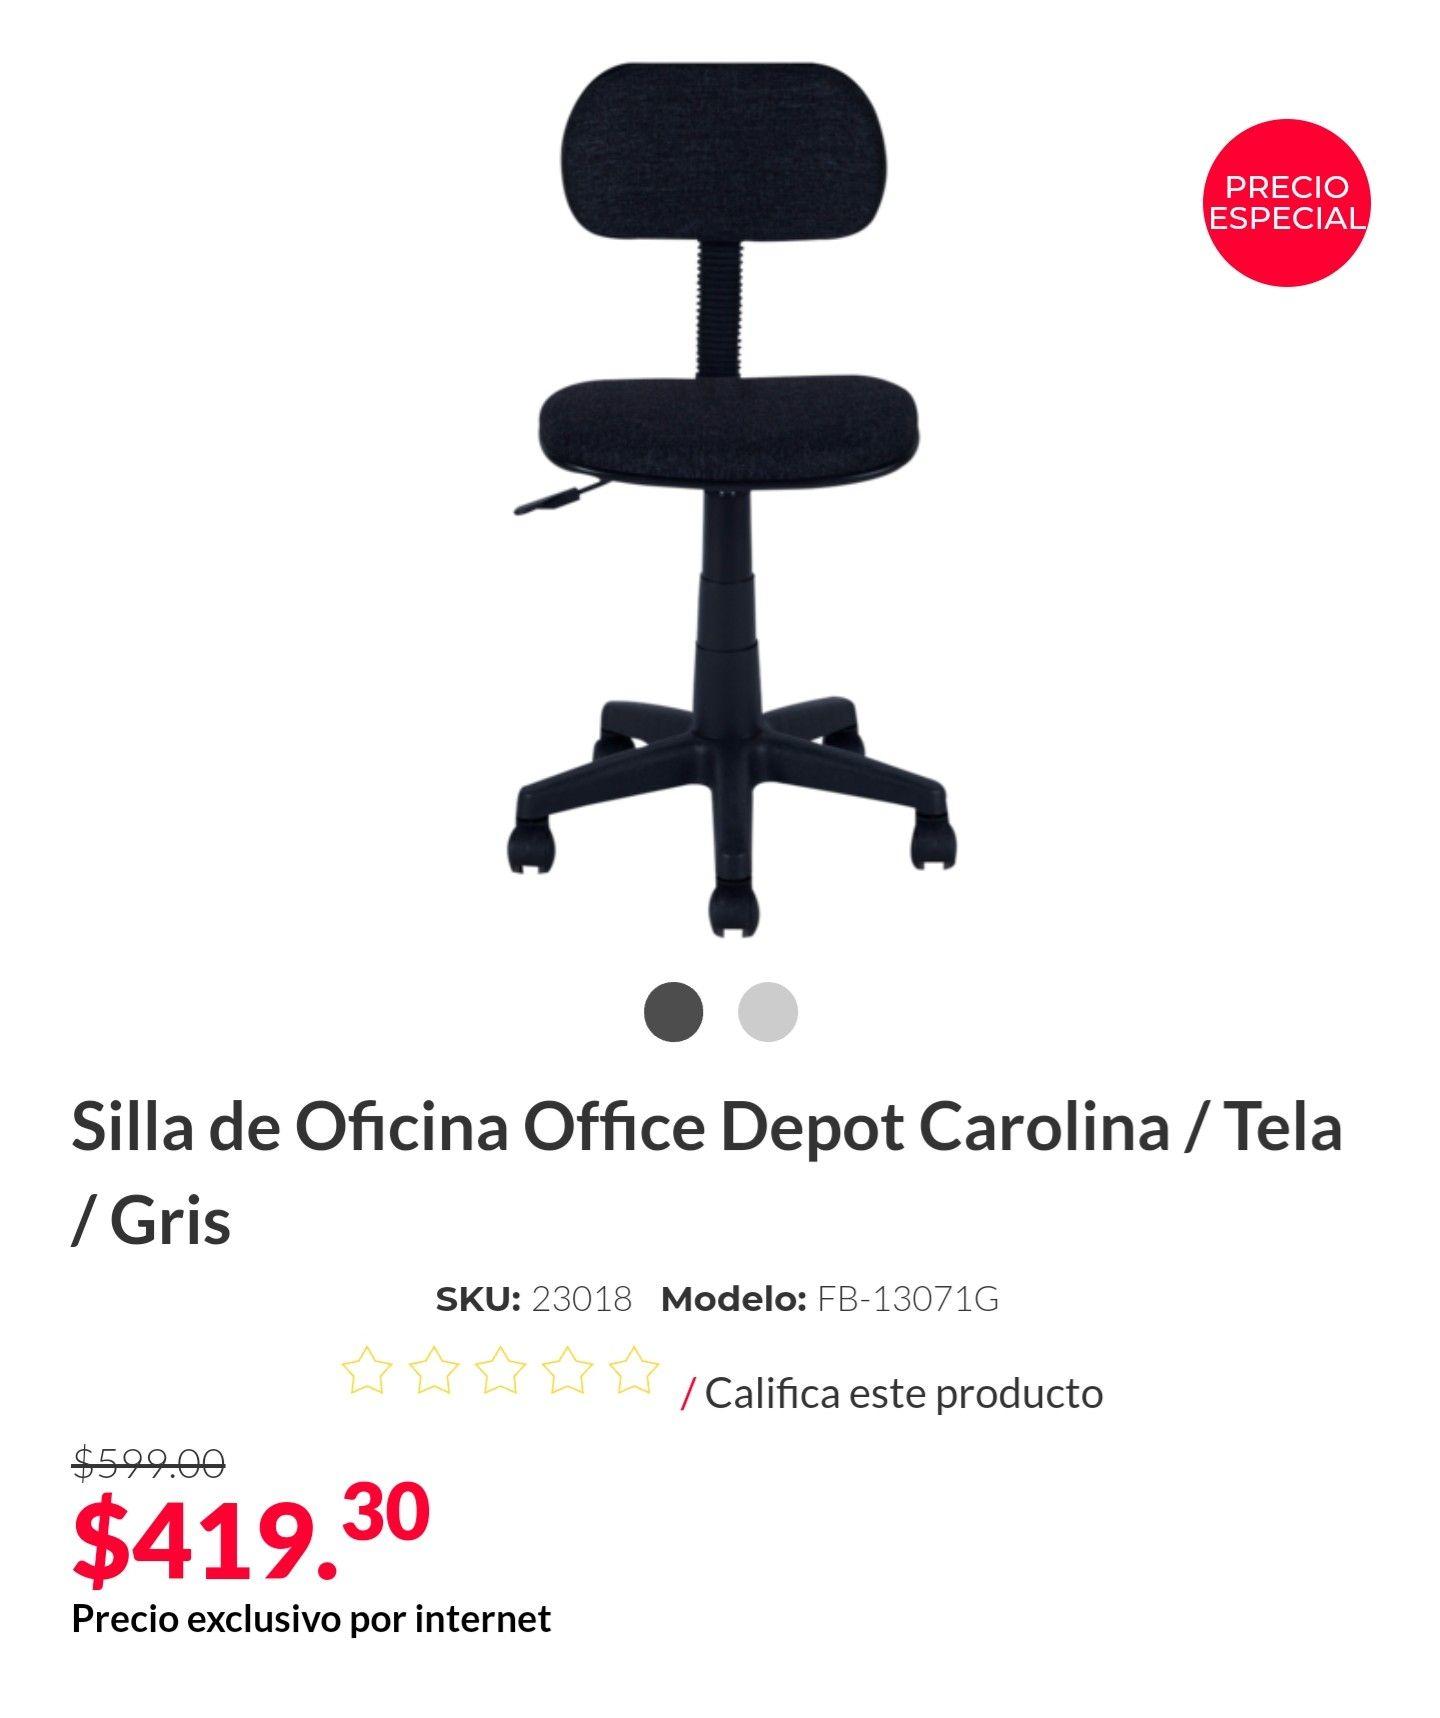 Office Depot: Silla de Oficina Office Depot Carolina / Tela / Gris